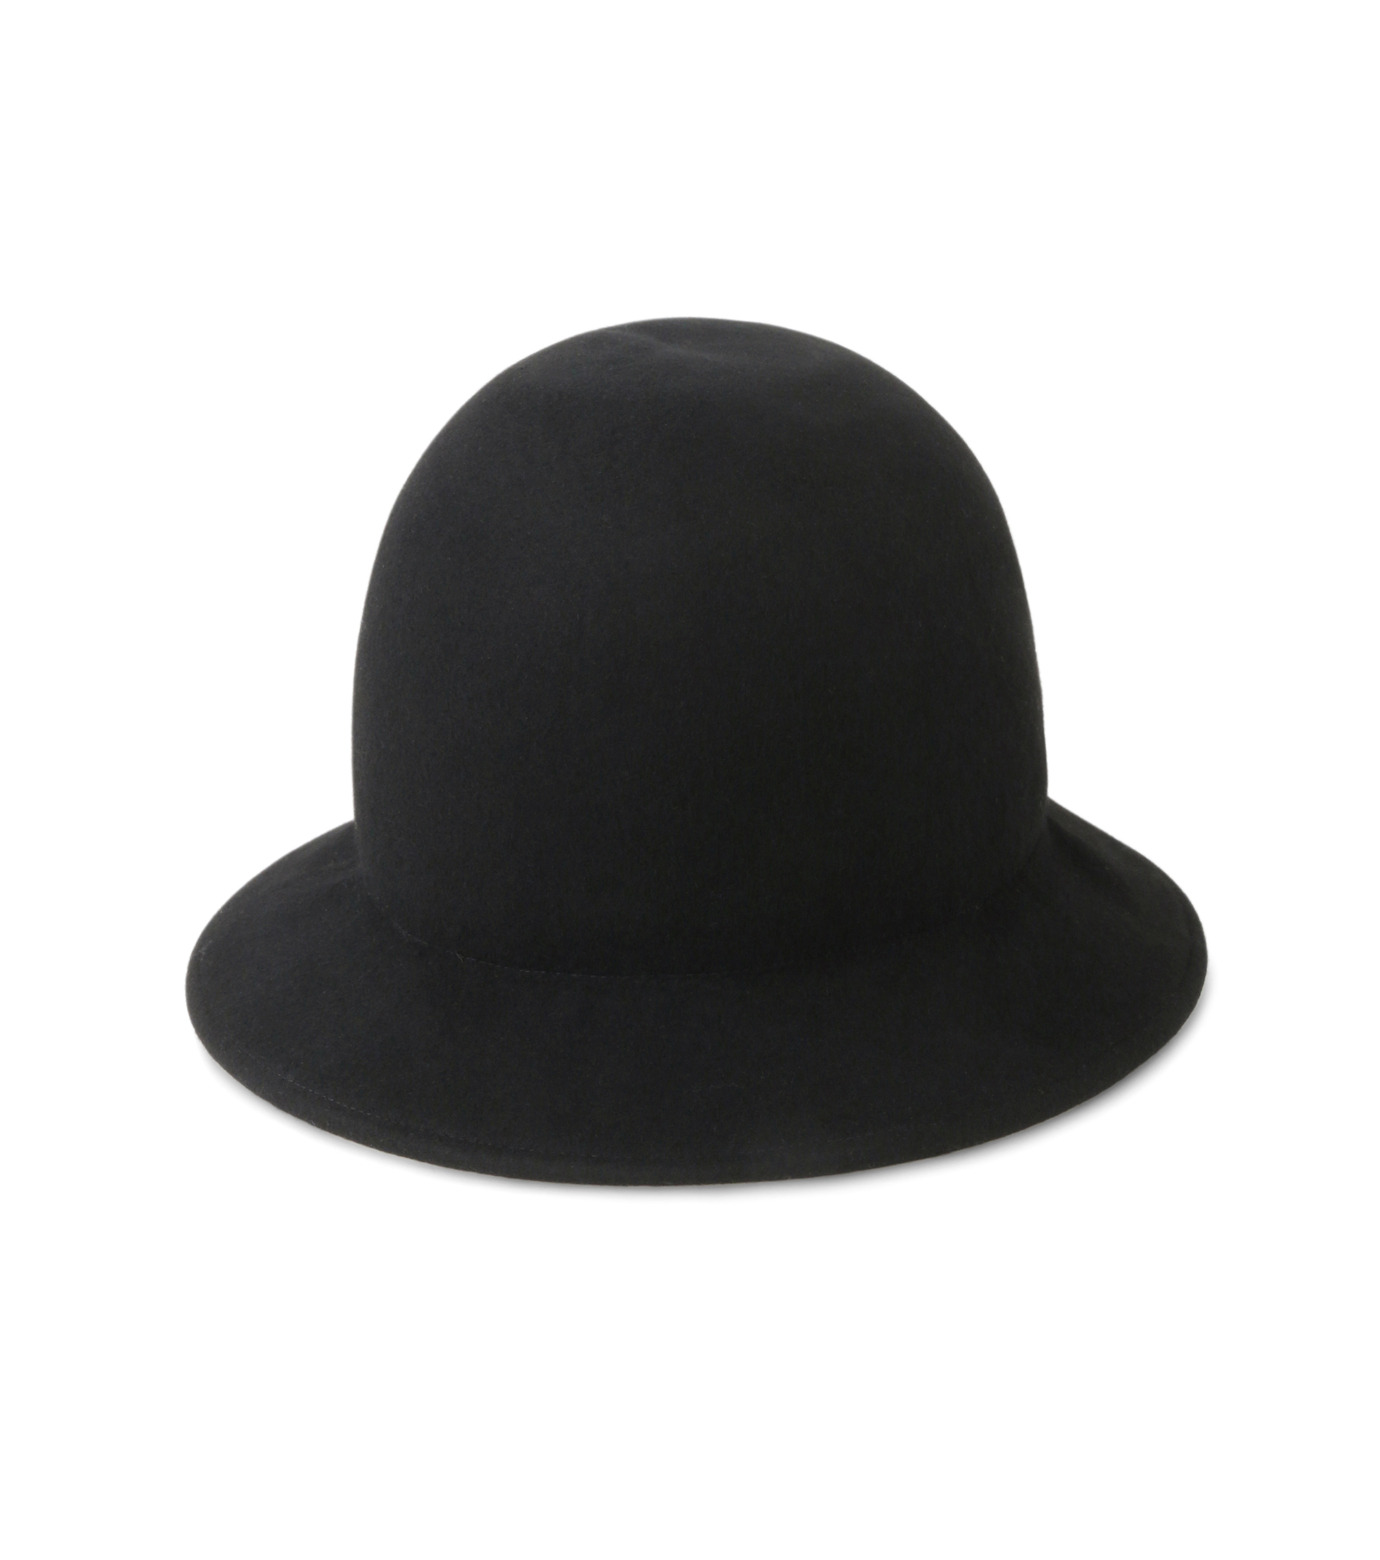 Sacai(サカイ)のHat-BLACK(キャップ/cap)-17-01274M-13 拡大詳細画像1